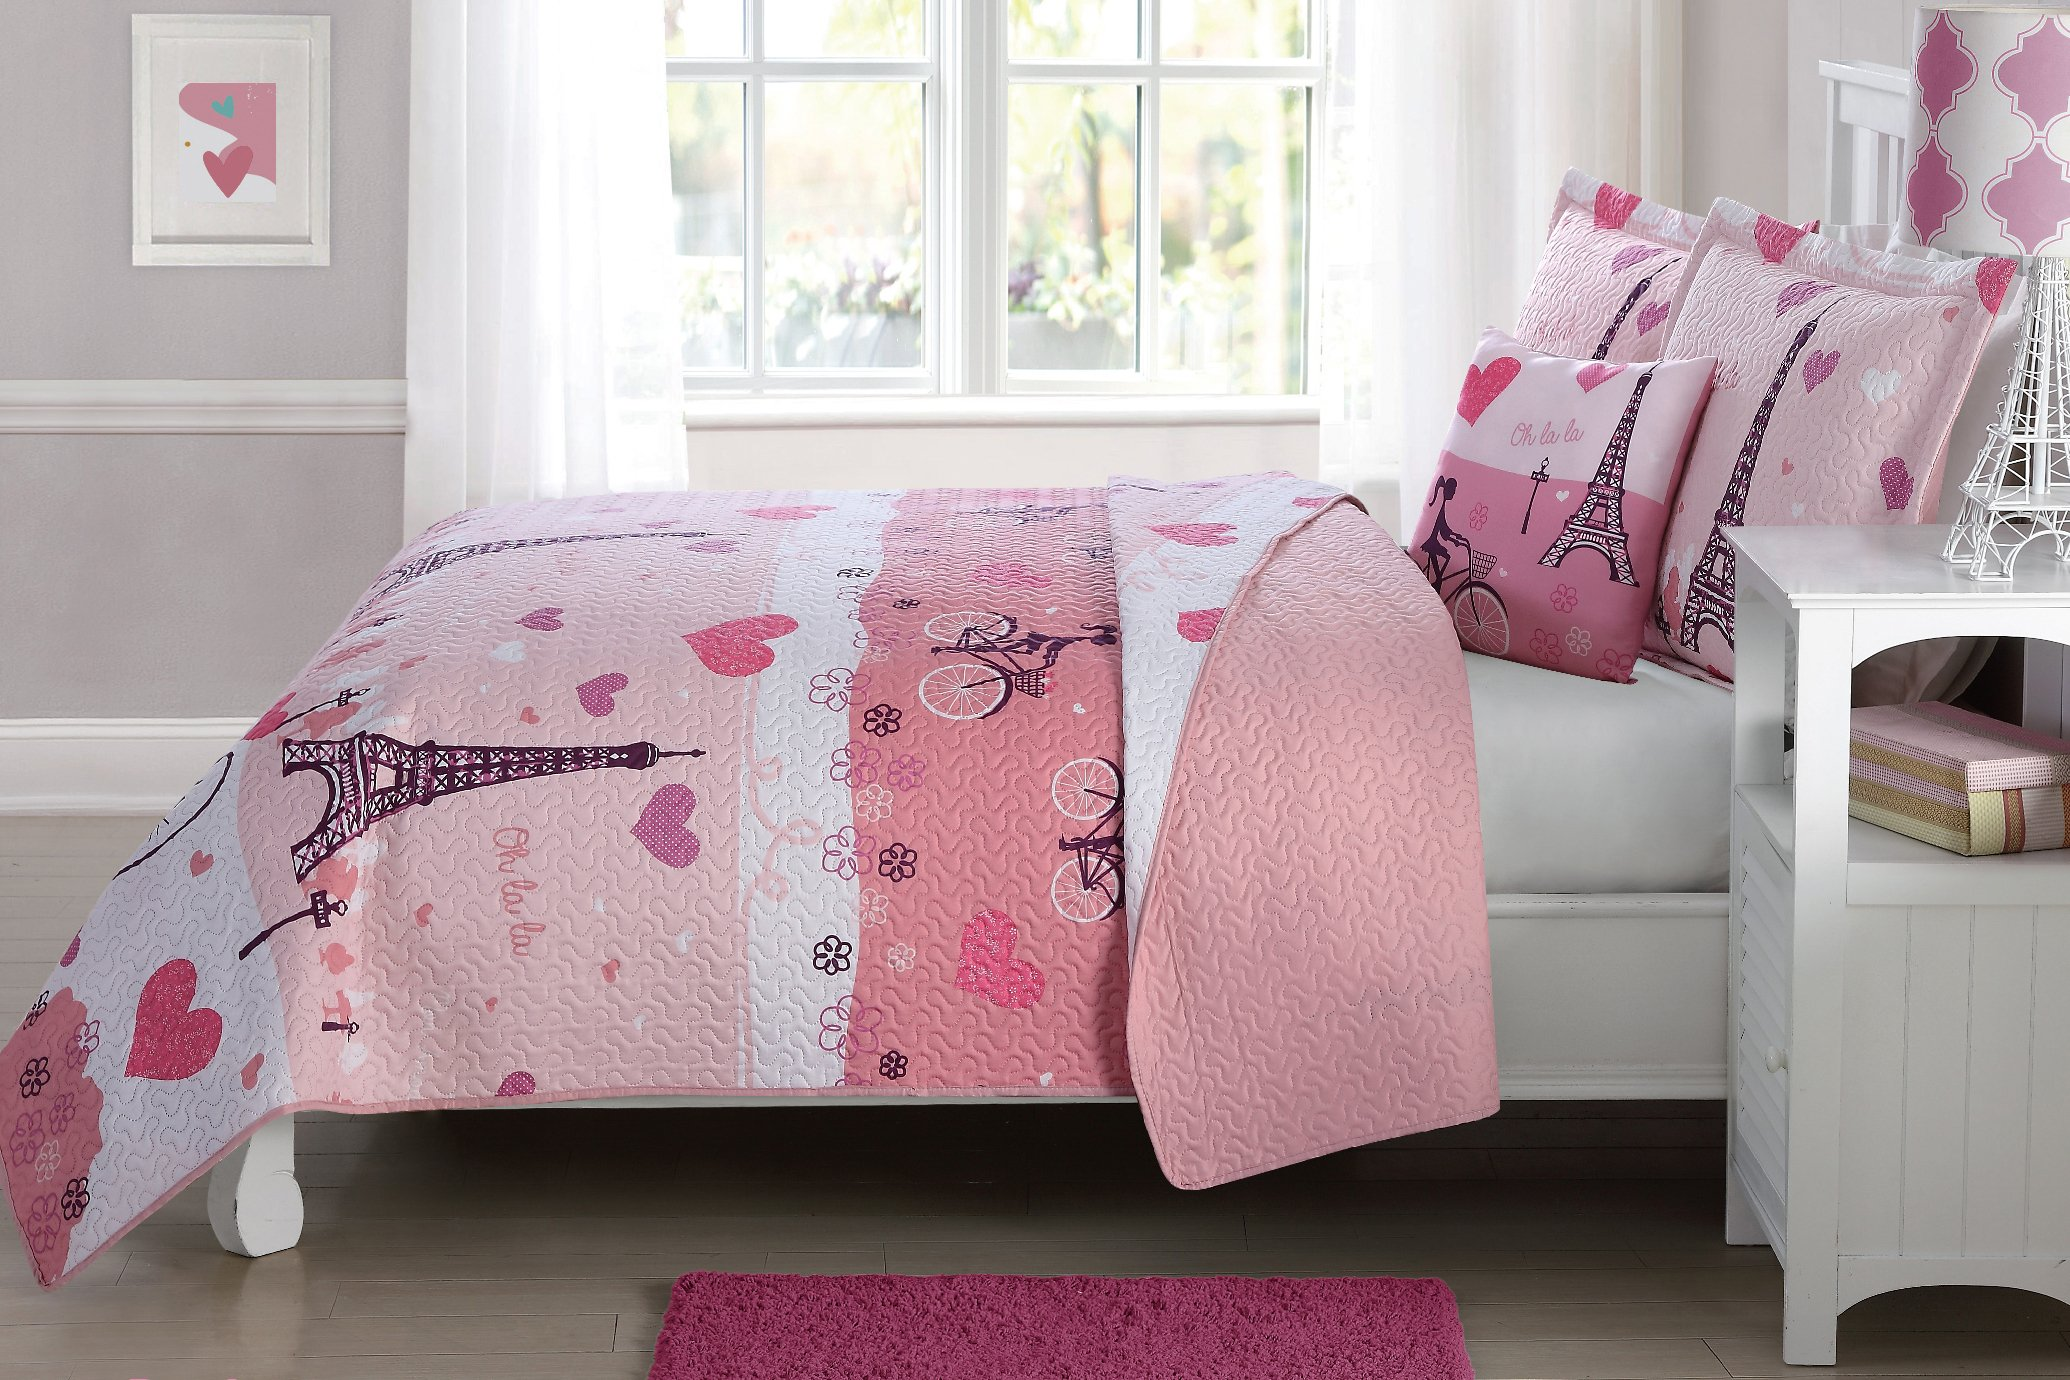 Fancy Linen Bedspread Coverlet Reversible Paris Pink white Purple Hearts Eiffel Tower New # Paris (Full)